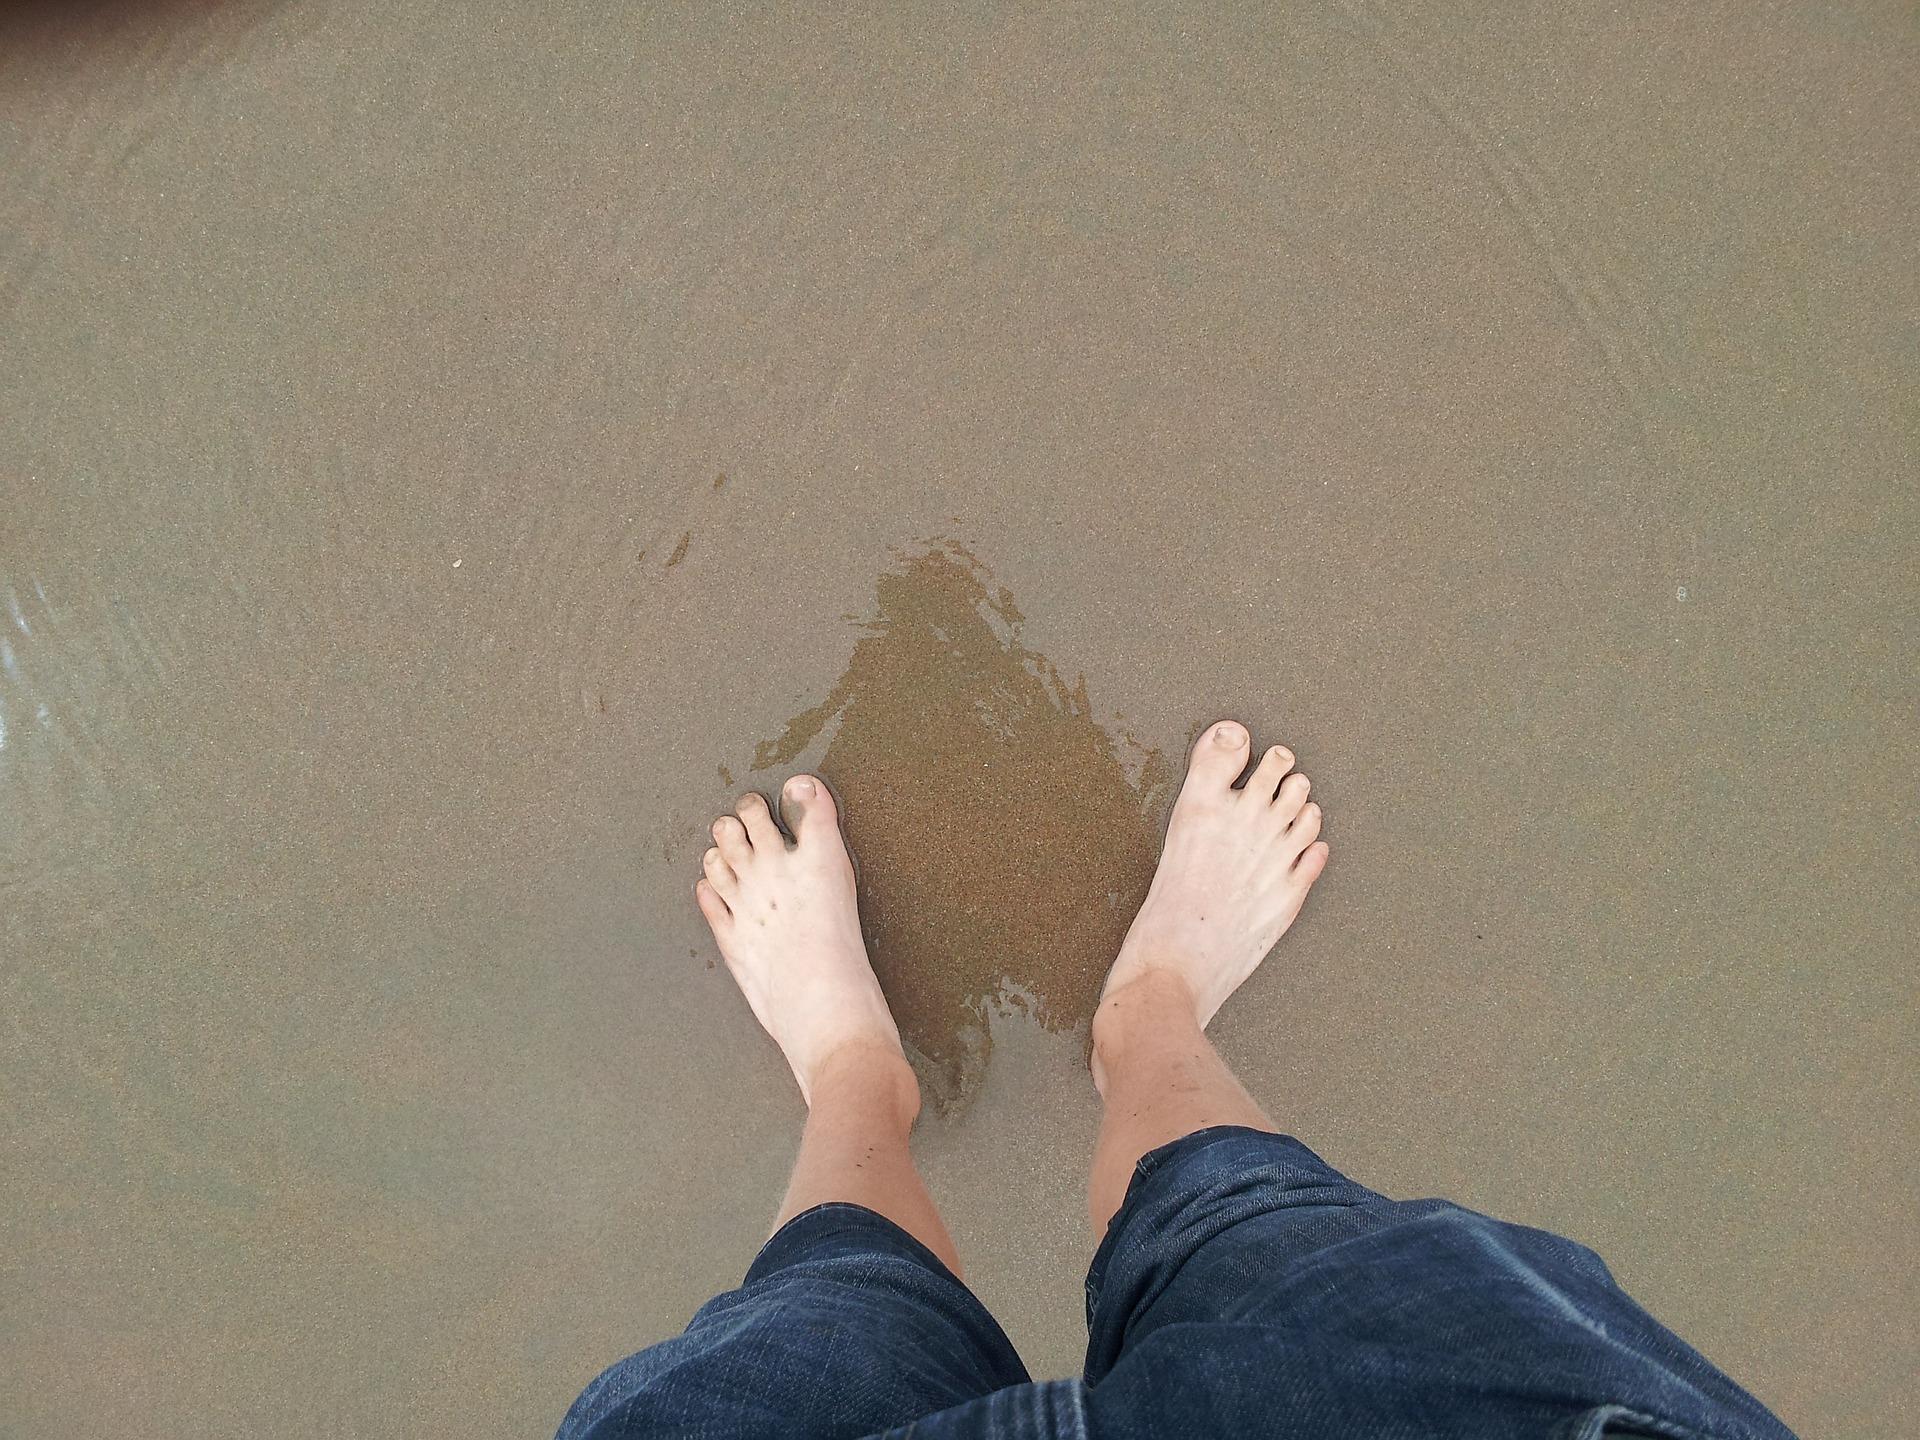 feet-381121_1920